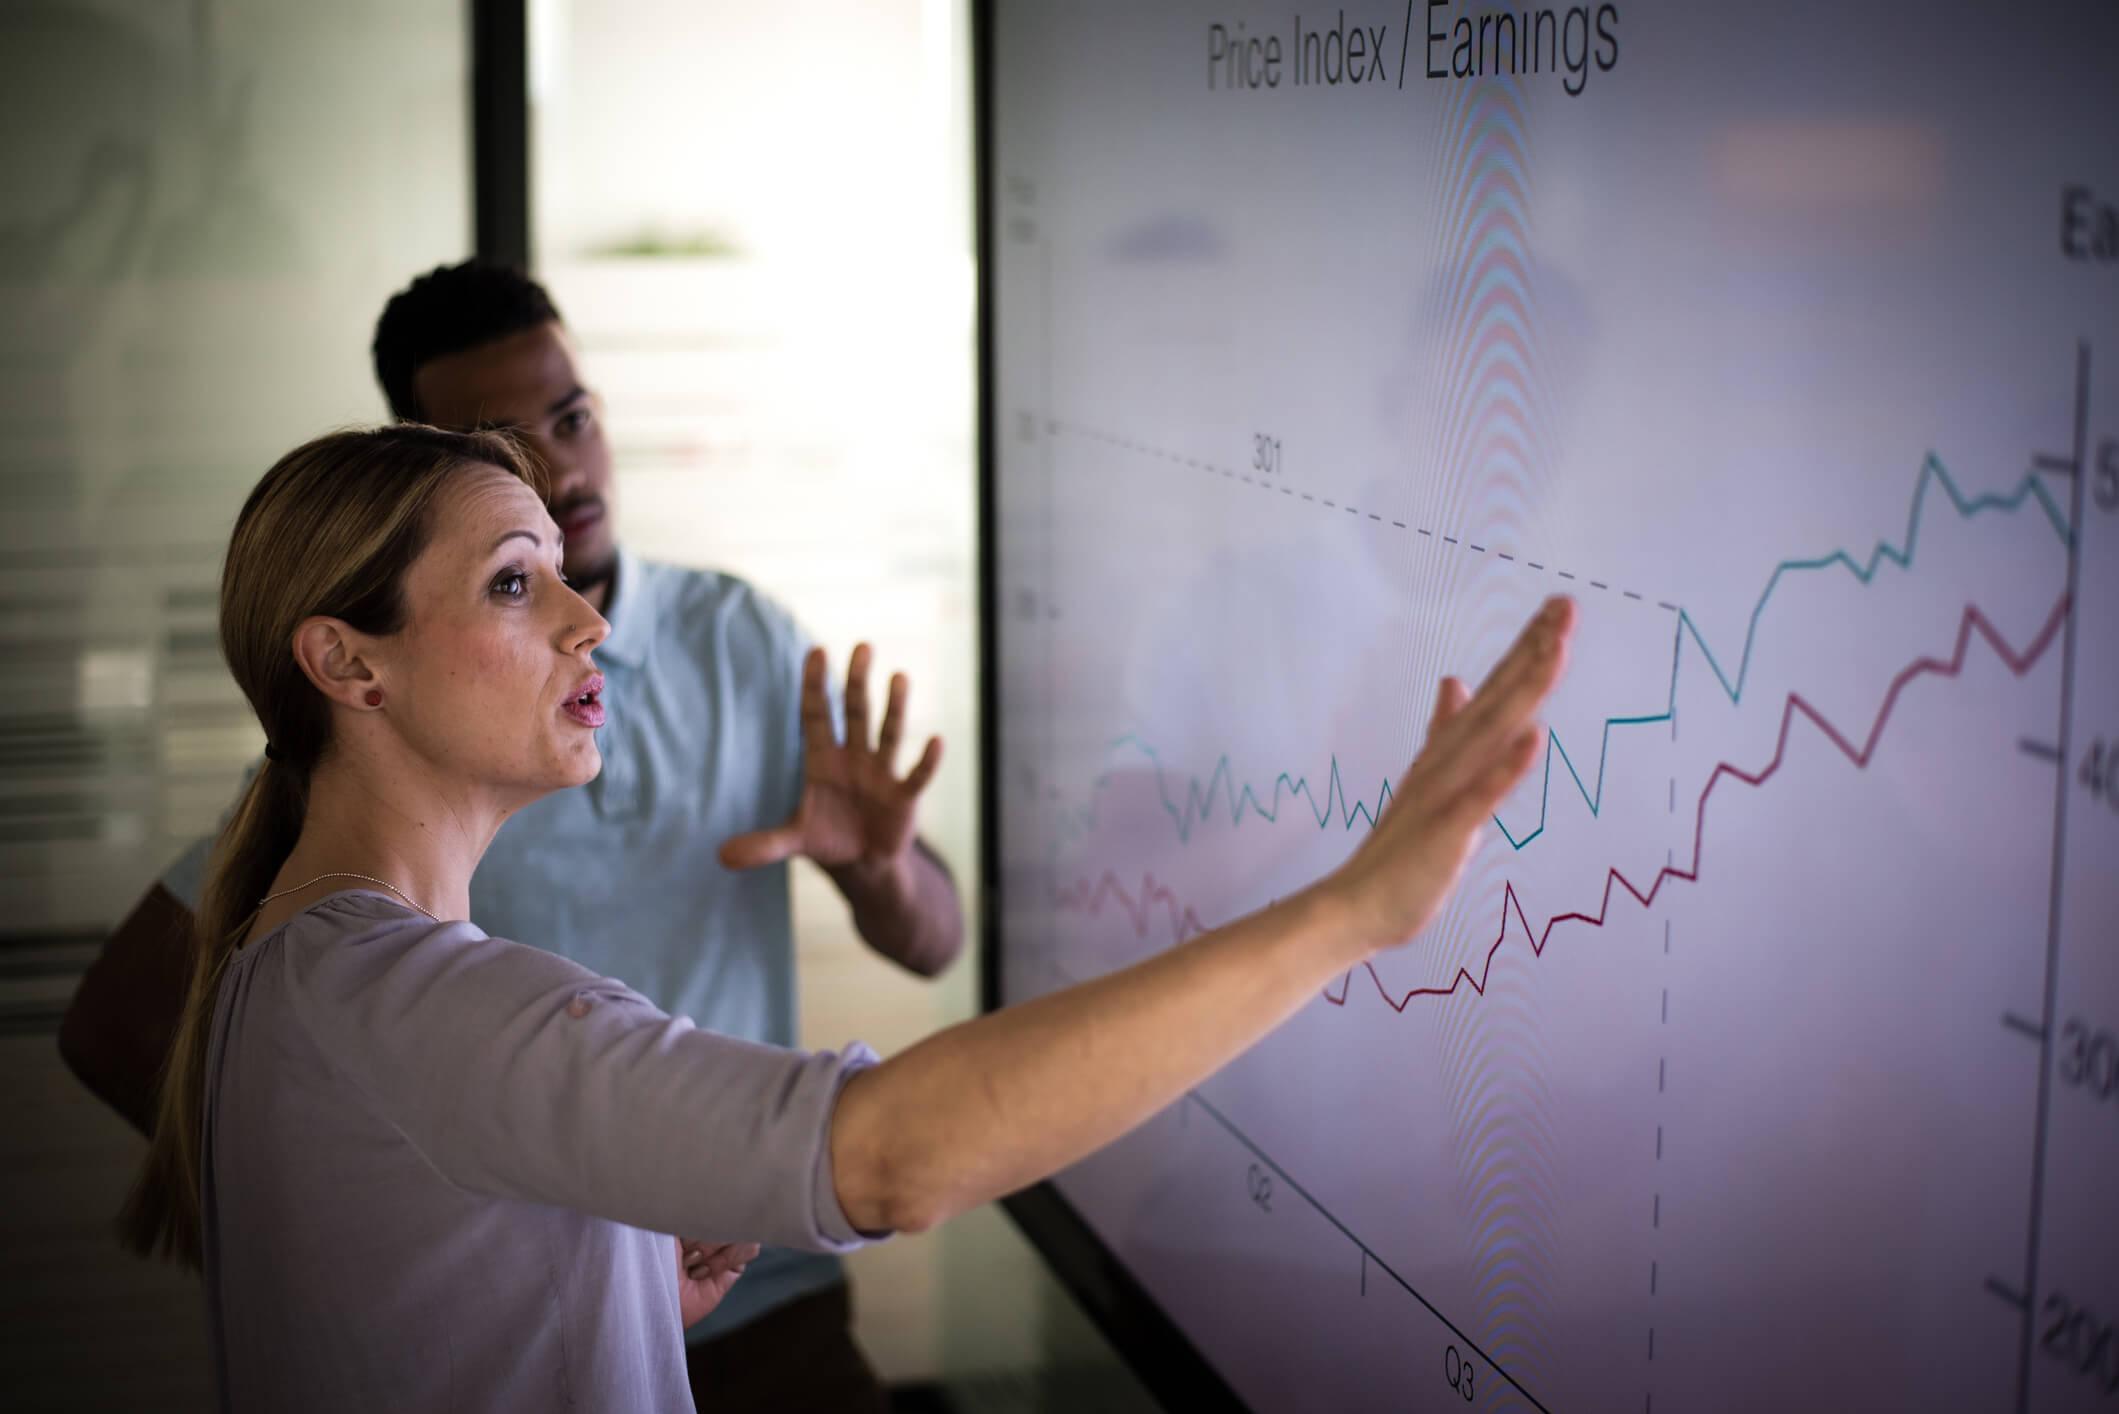 Saiba o que é growth hacking e gere resultados rápidos e assertivos